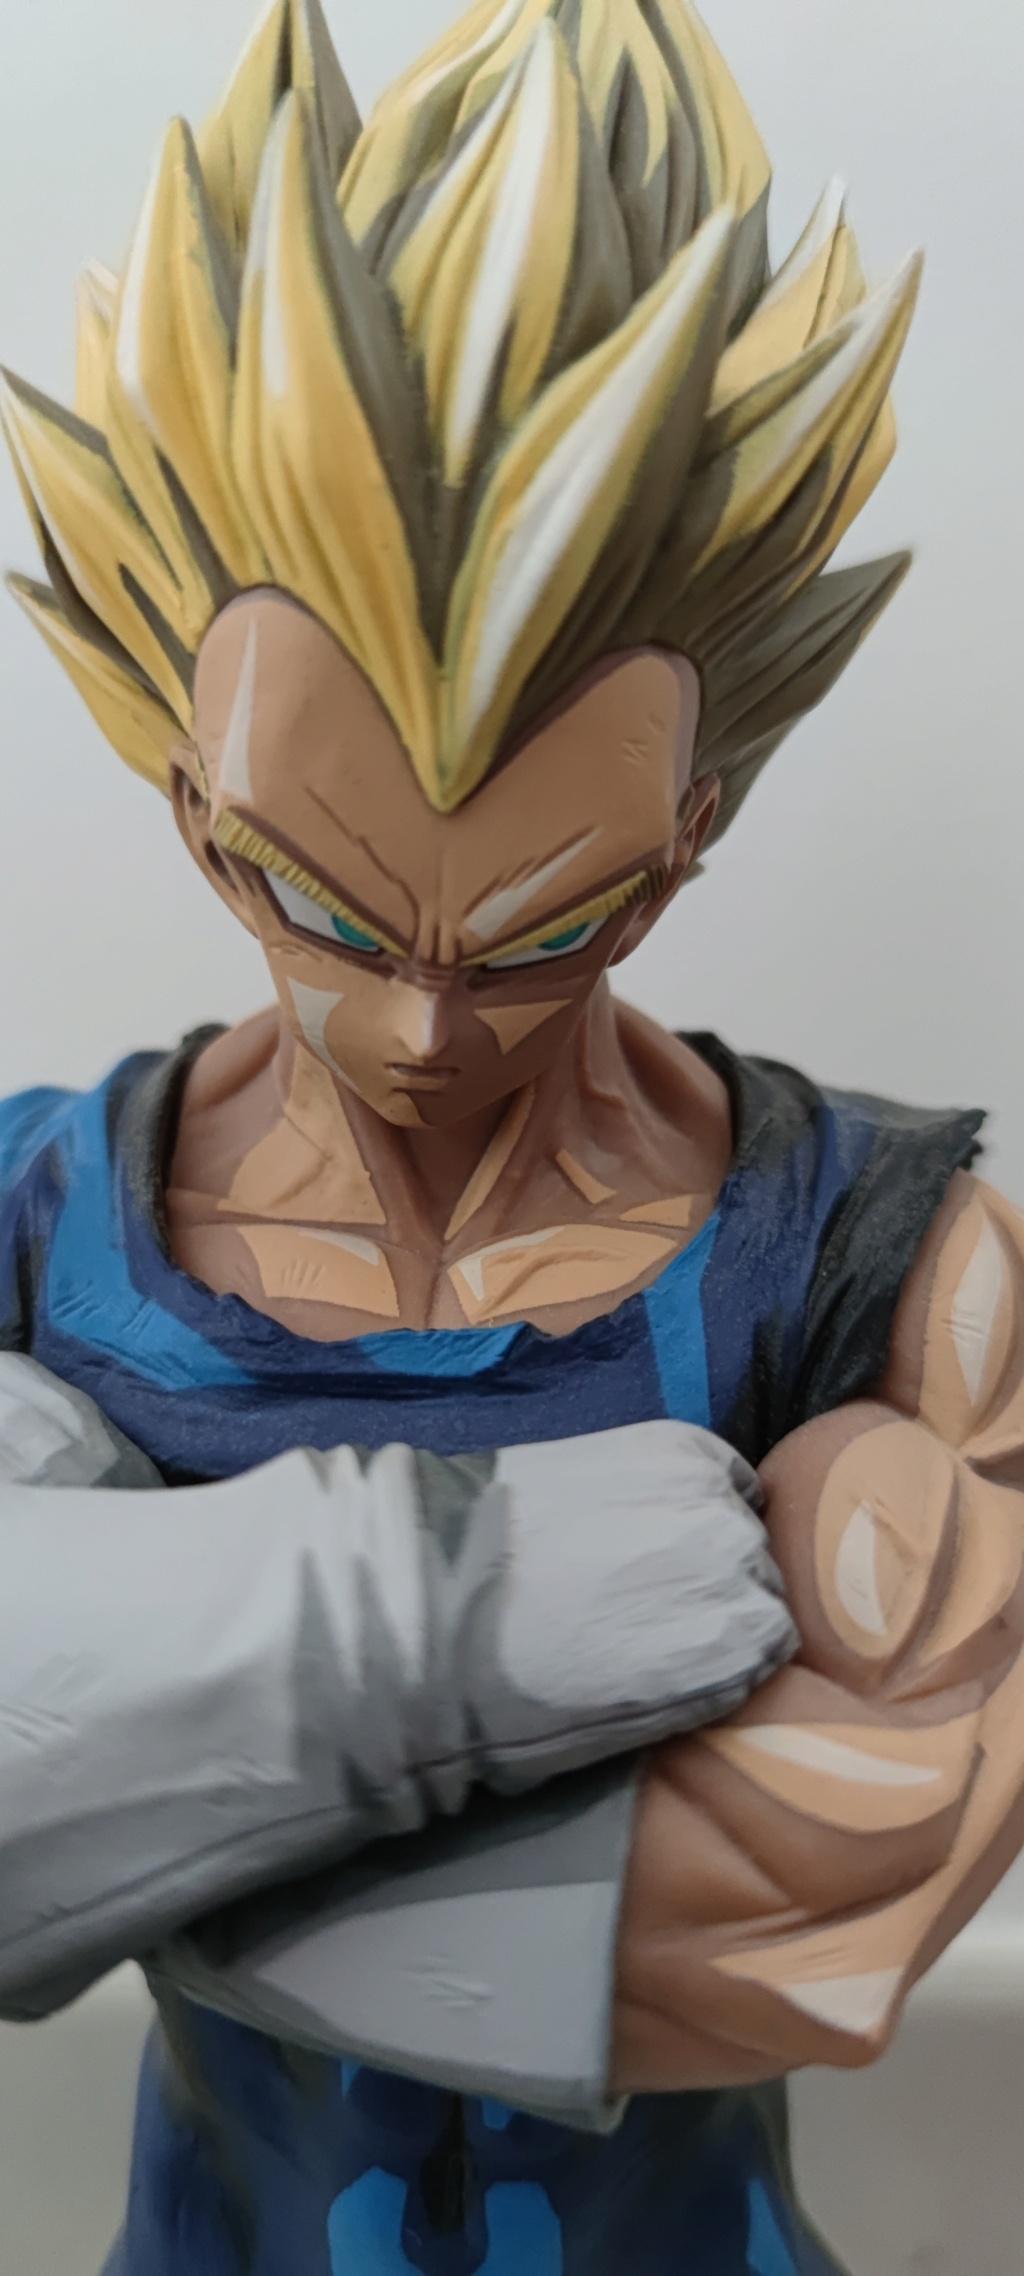 [VDS] Figurines Dragon Ball, One piece, Naruto, Megaman etc....  16162411